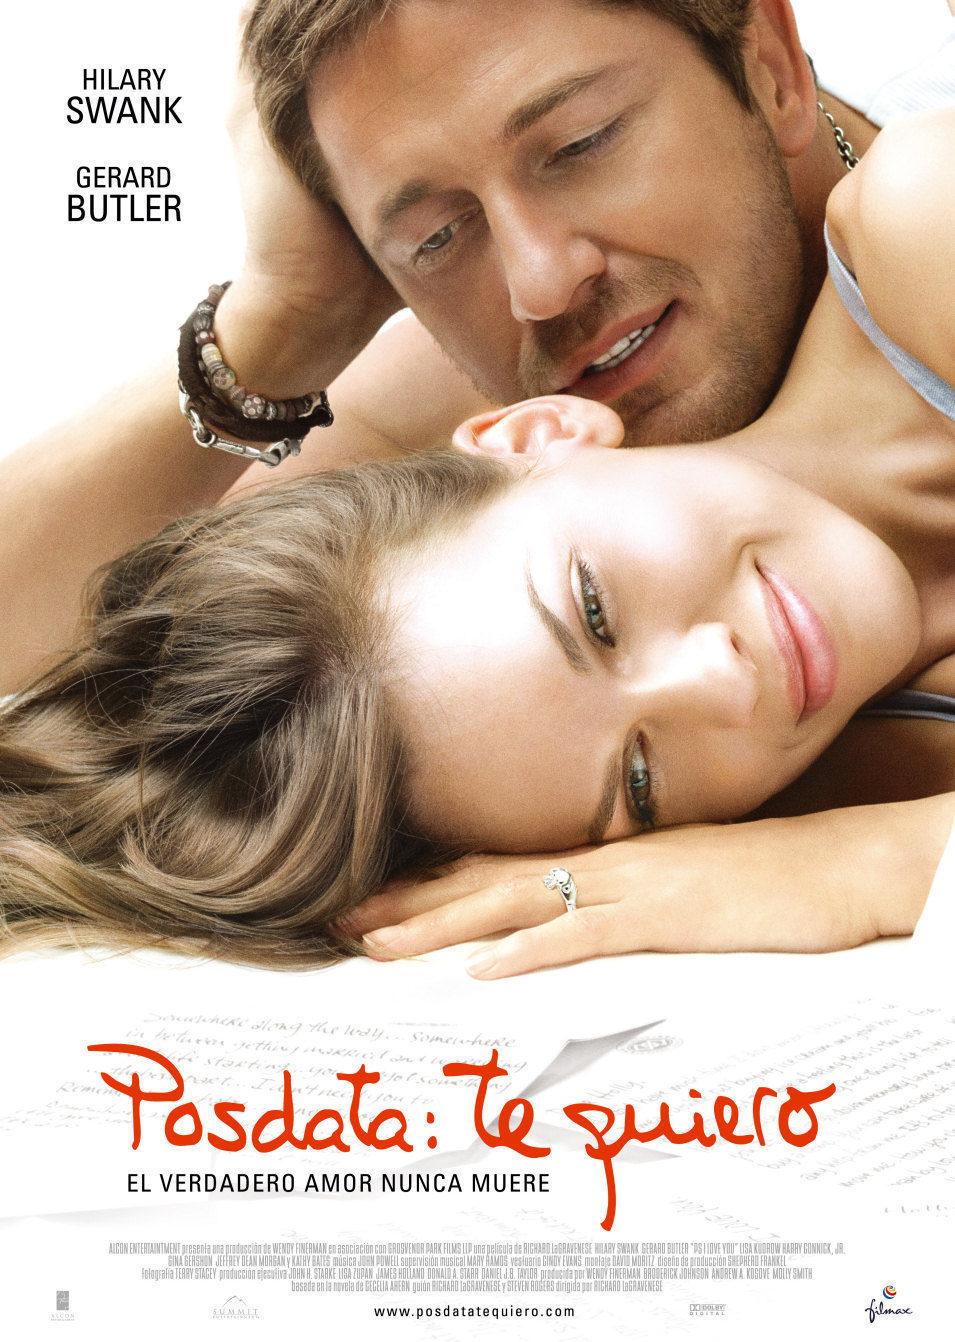 España poster for P.S. I love you